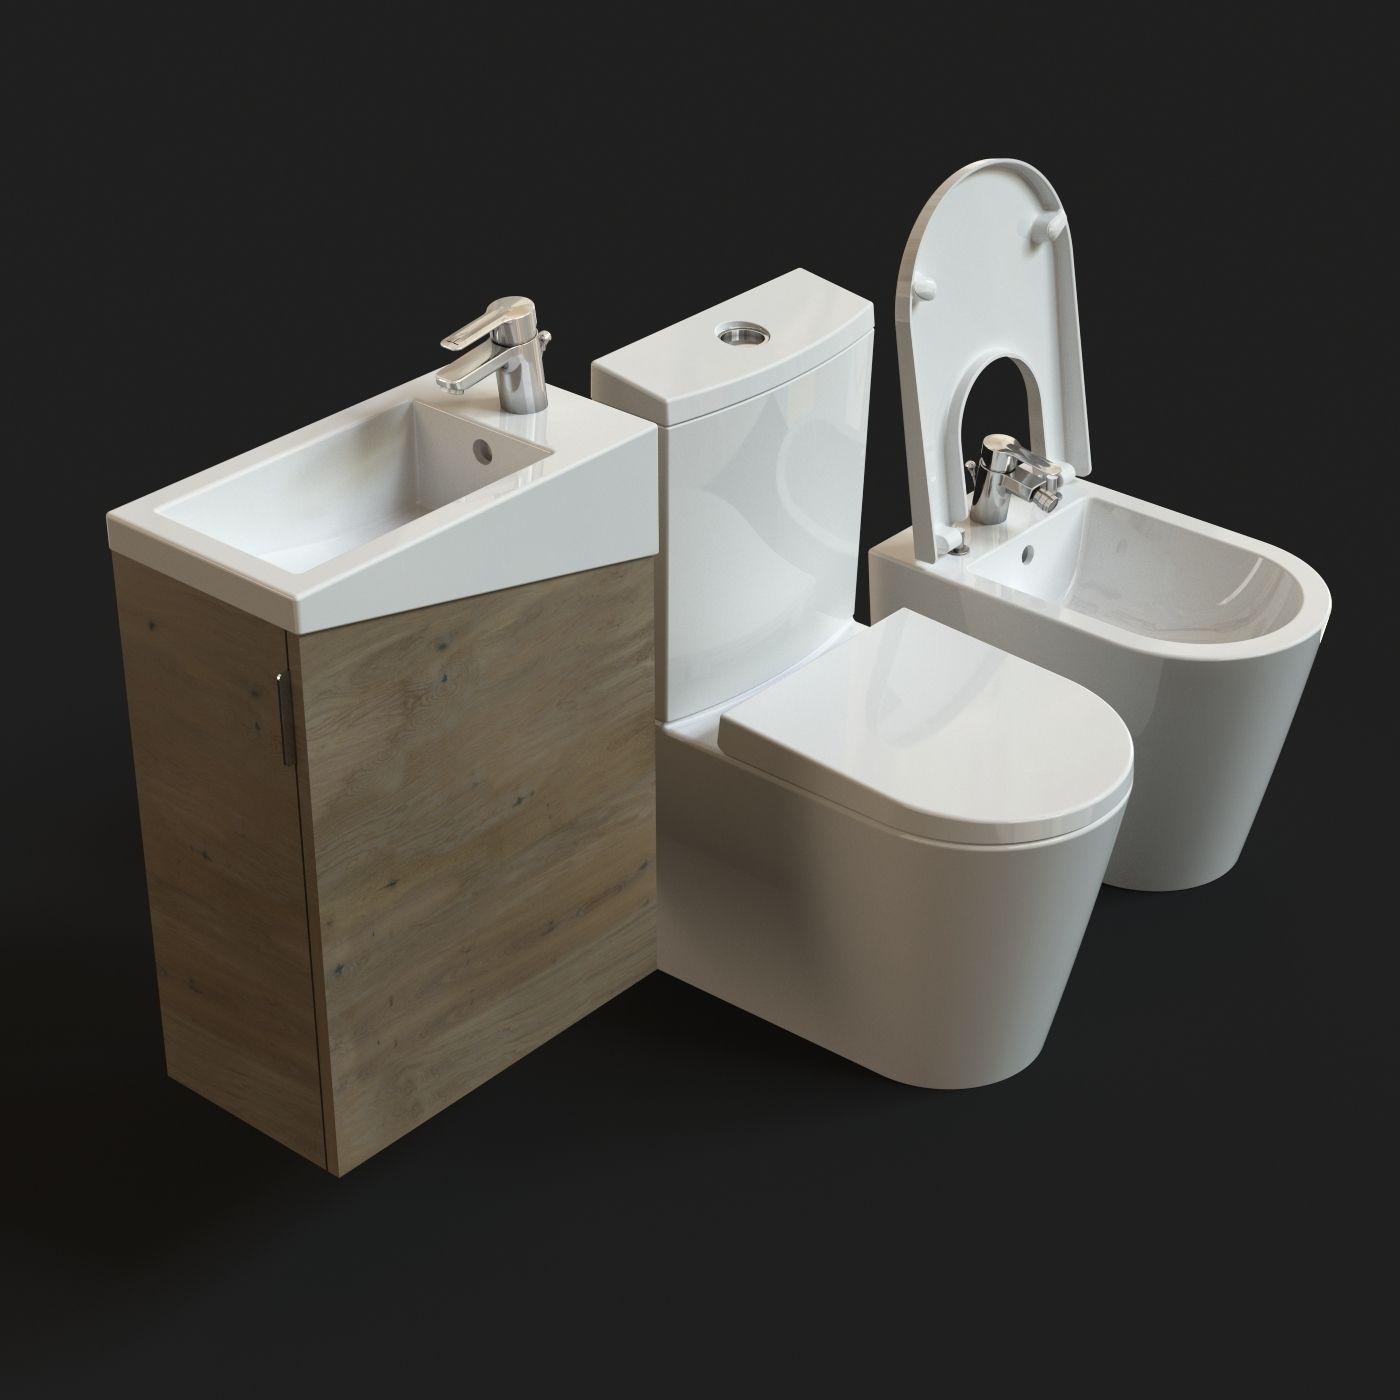 Urb y plus sanitaryware free model free 3d model max obj for New bathroom models